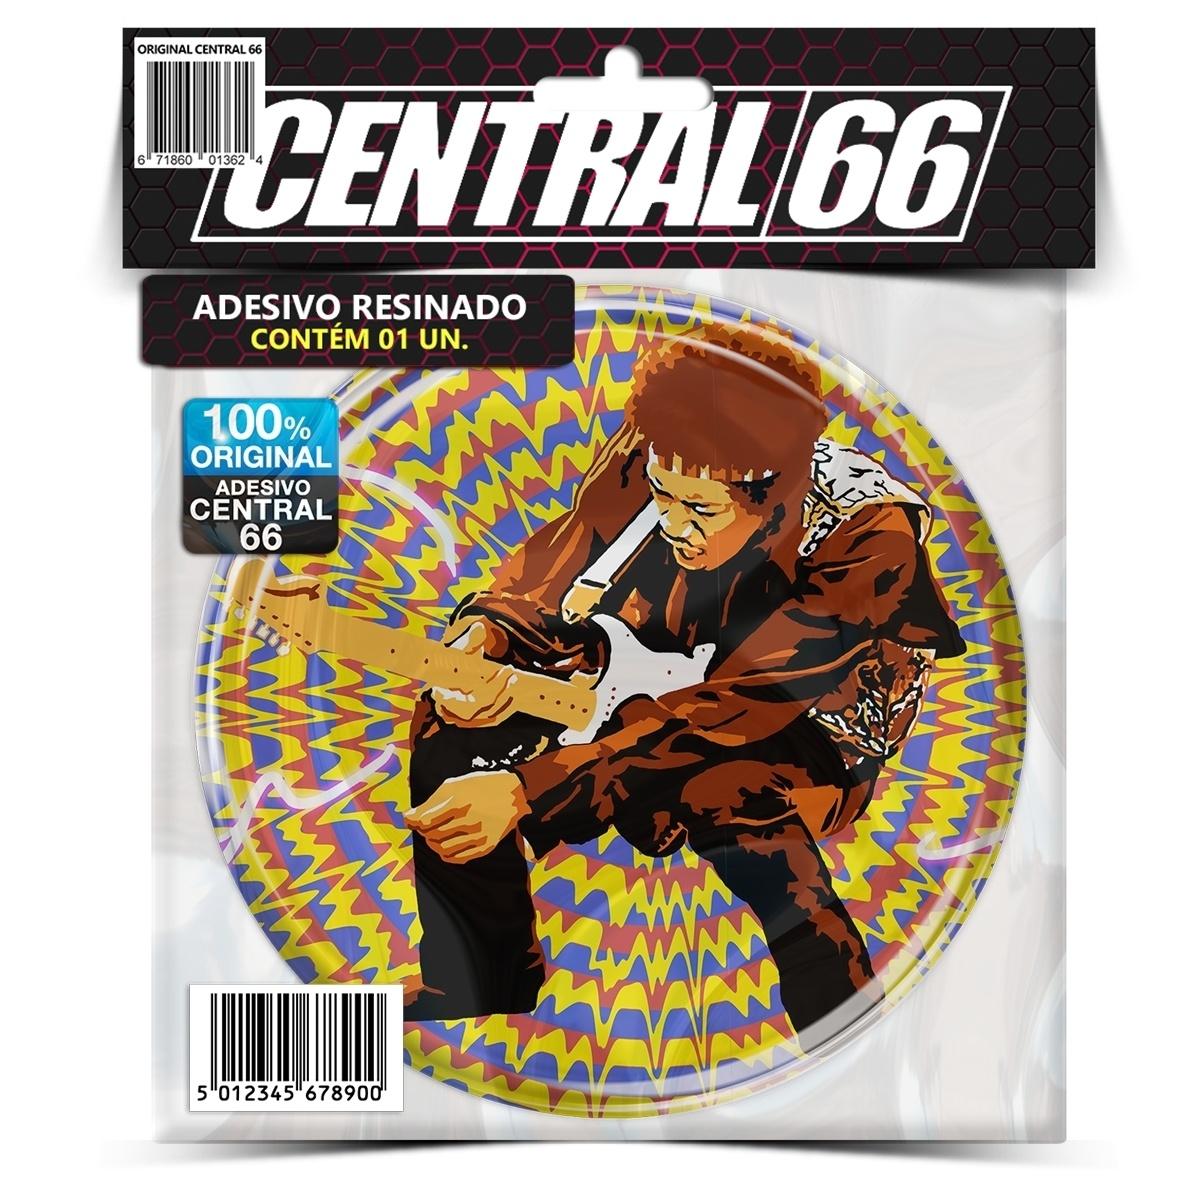 Adesivo Redondo Ozzy Osbourne – Central 66